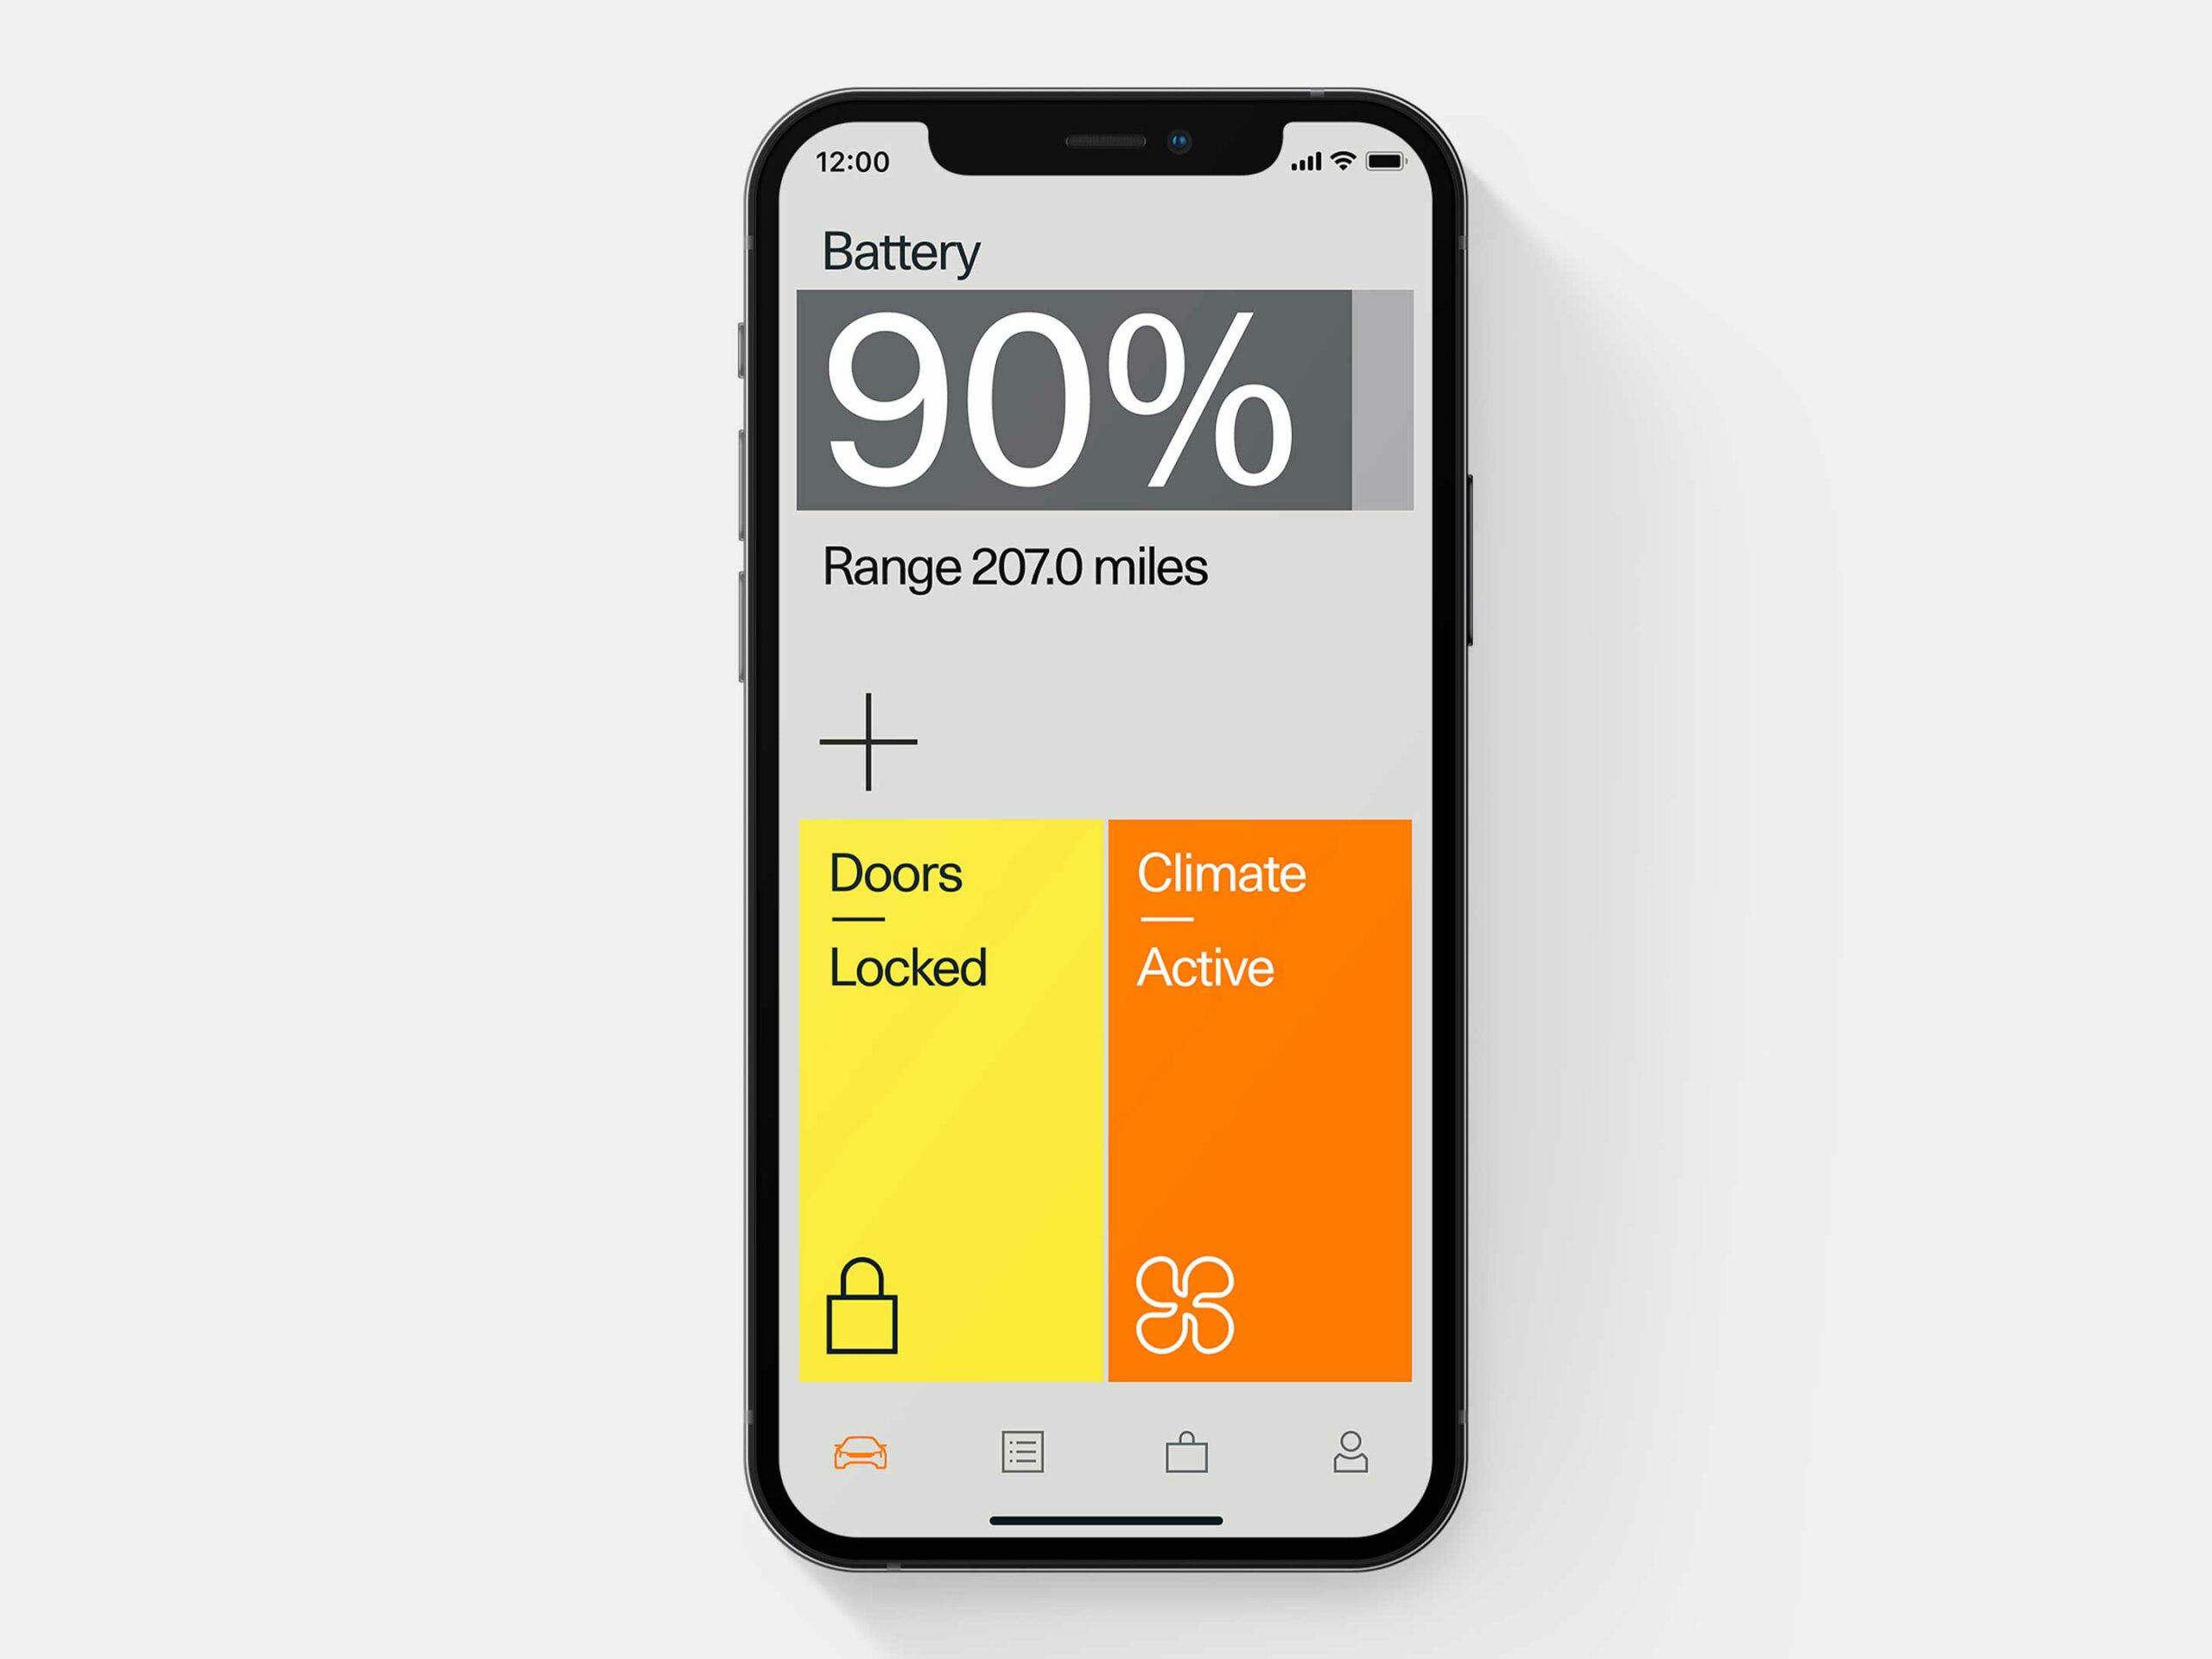 Polestar 2 updated with phone-based key among other improvements